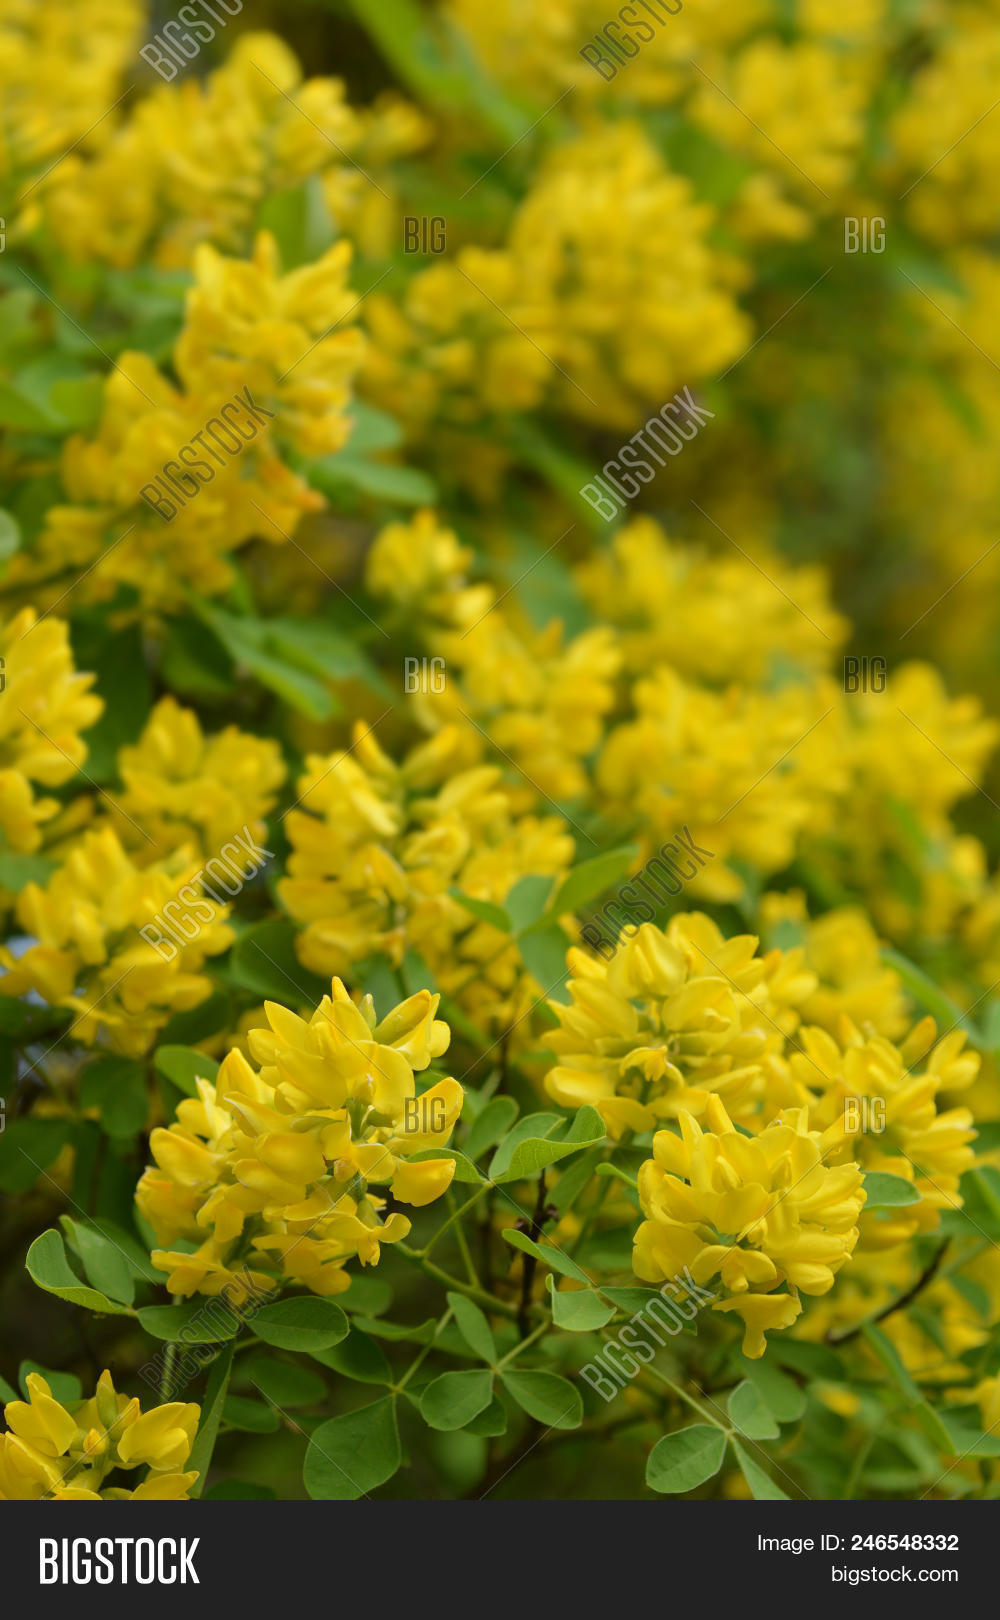 dalmatian laburnum yellow flowers and buds latin name dalmatian mightylinksfo